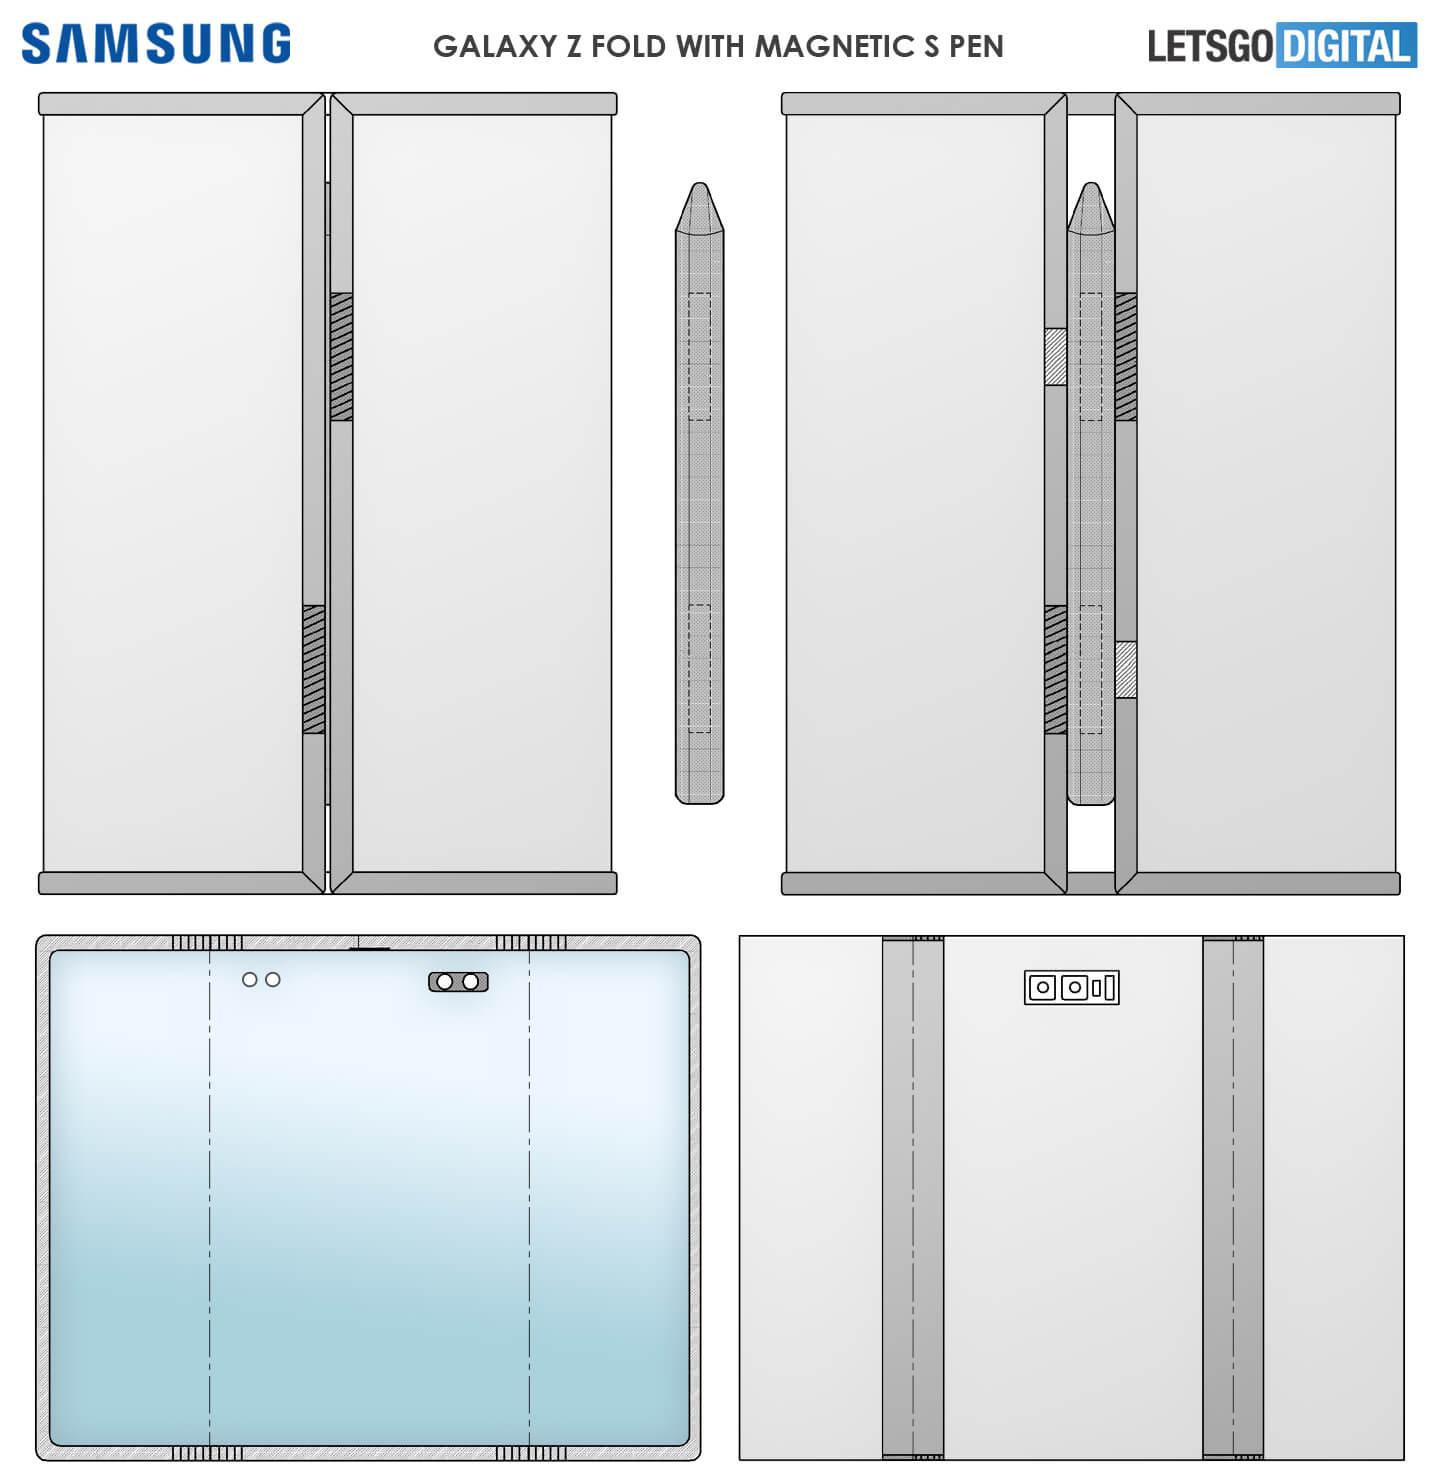 Samsung Z Fold S-Pen magnetisch